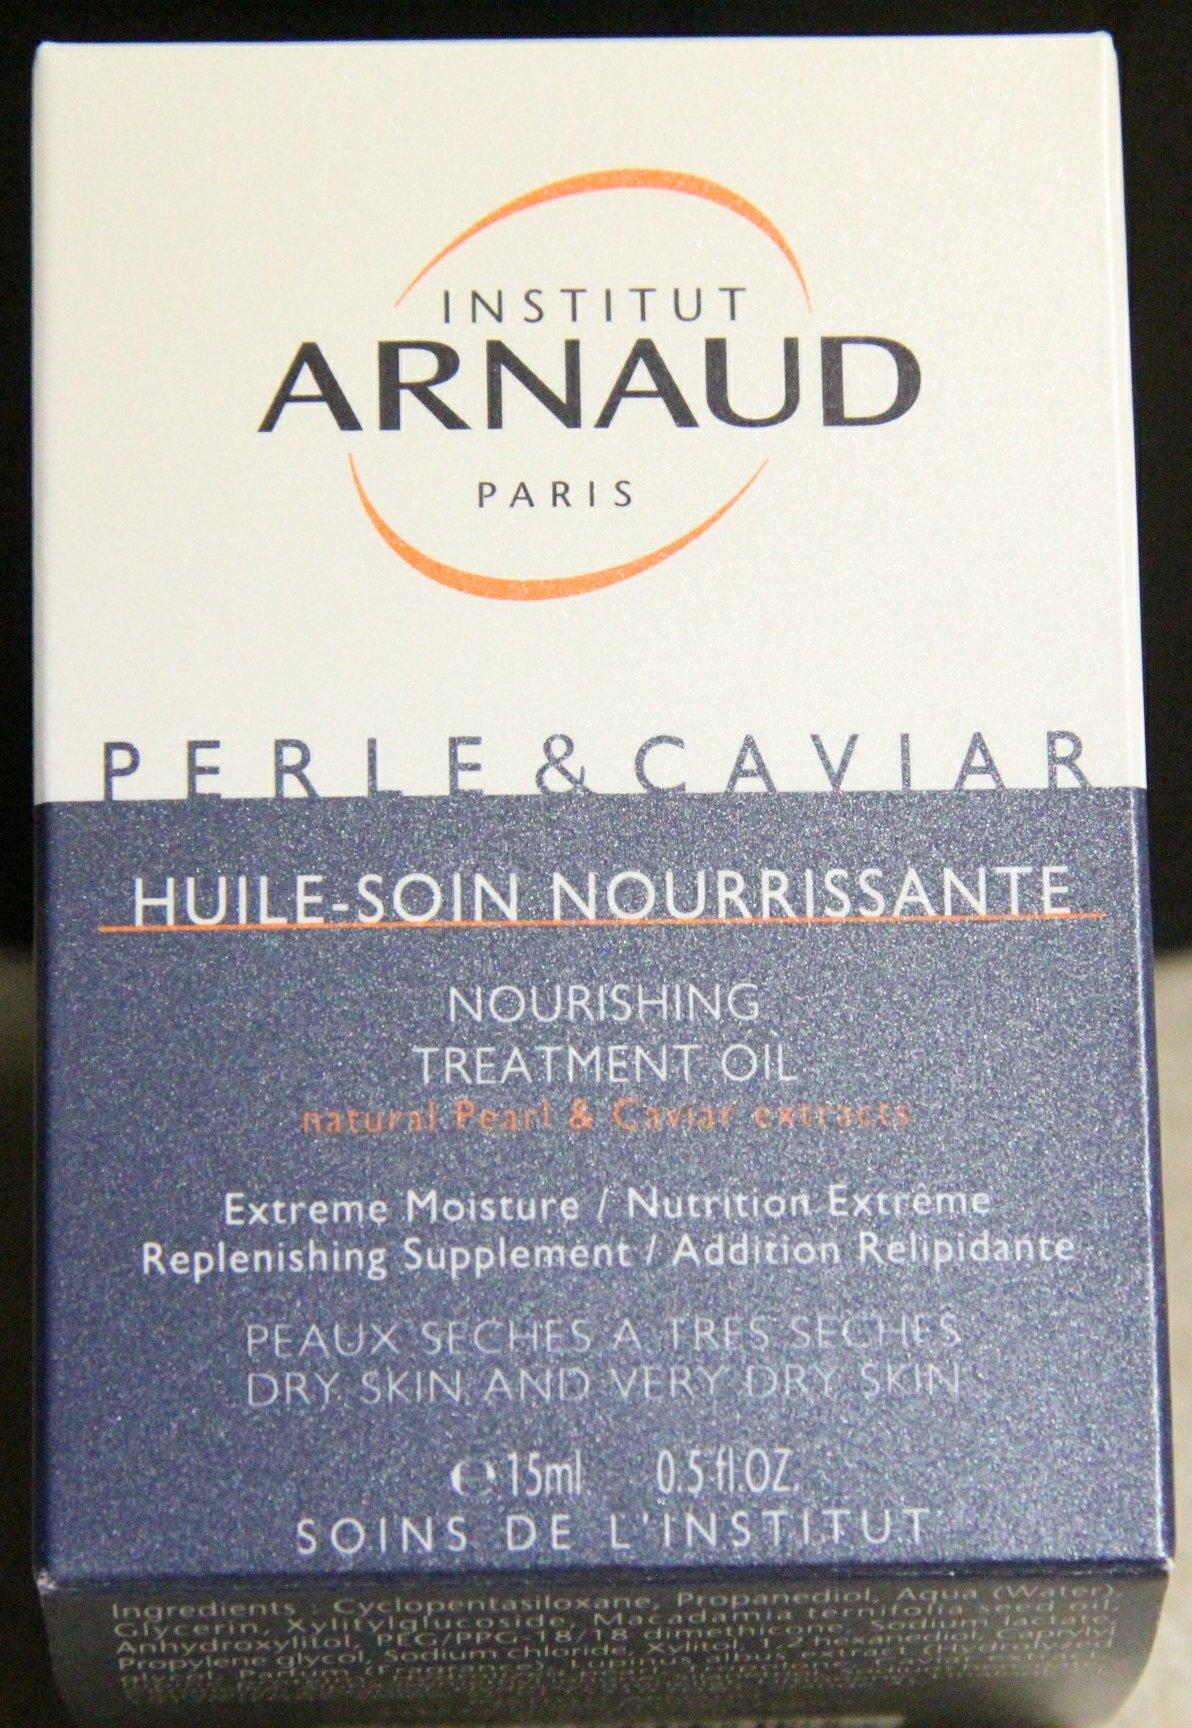 Institut Arnaud Paris Perle & Caviar Nourishing Treatment Oil Natural Pearl & Caviar Extracts